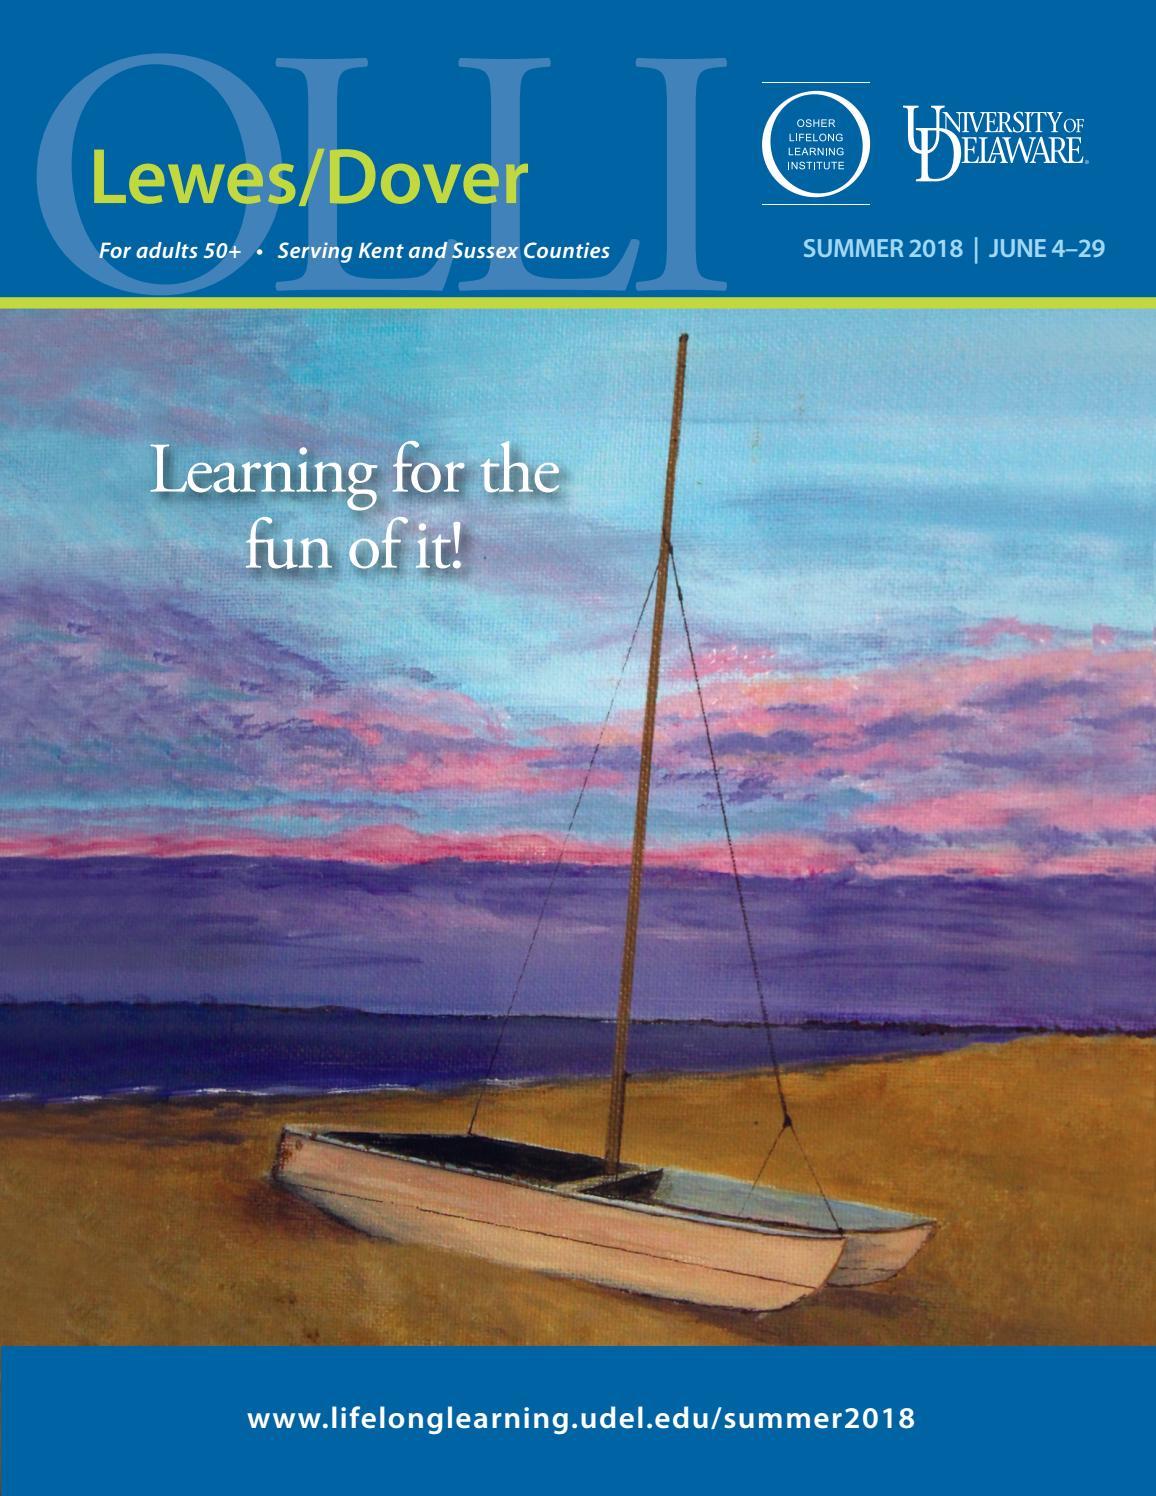 UD Osher Lewes/Dover Catalog, Summer 2018 by University of Delaware ...